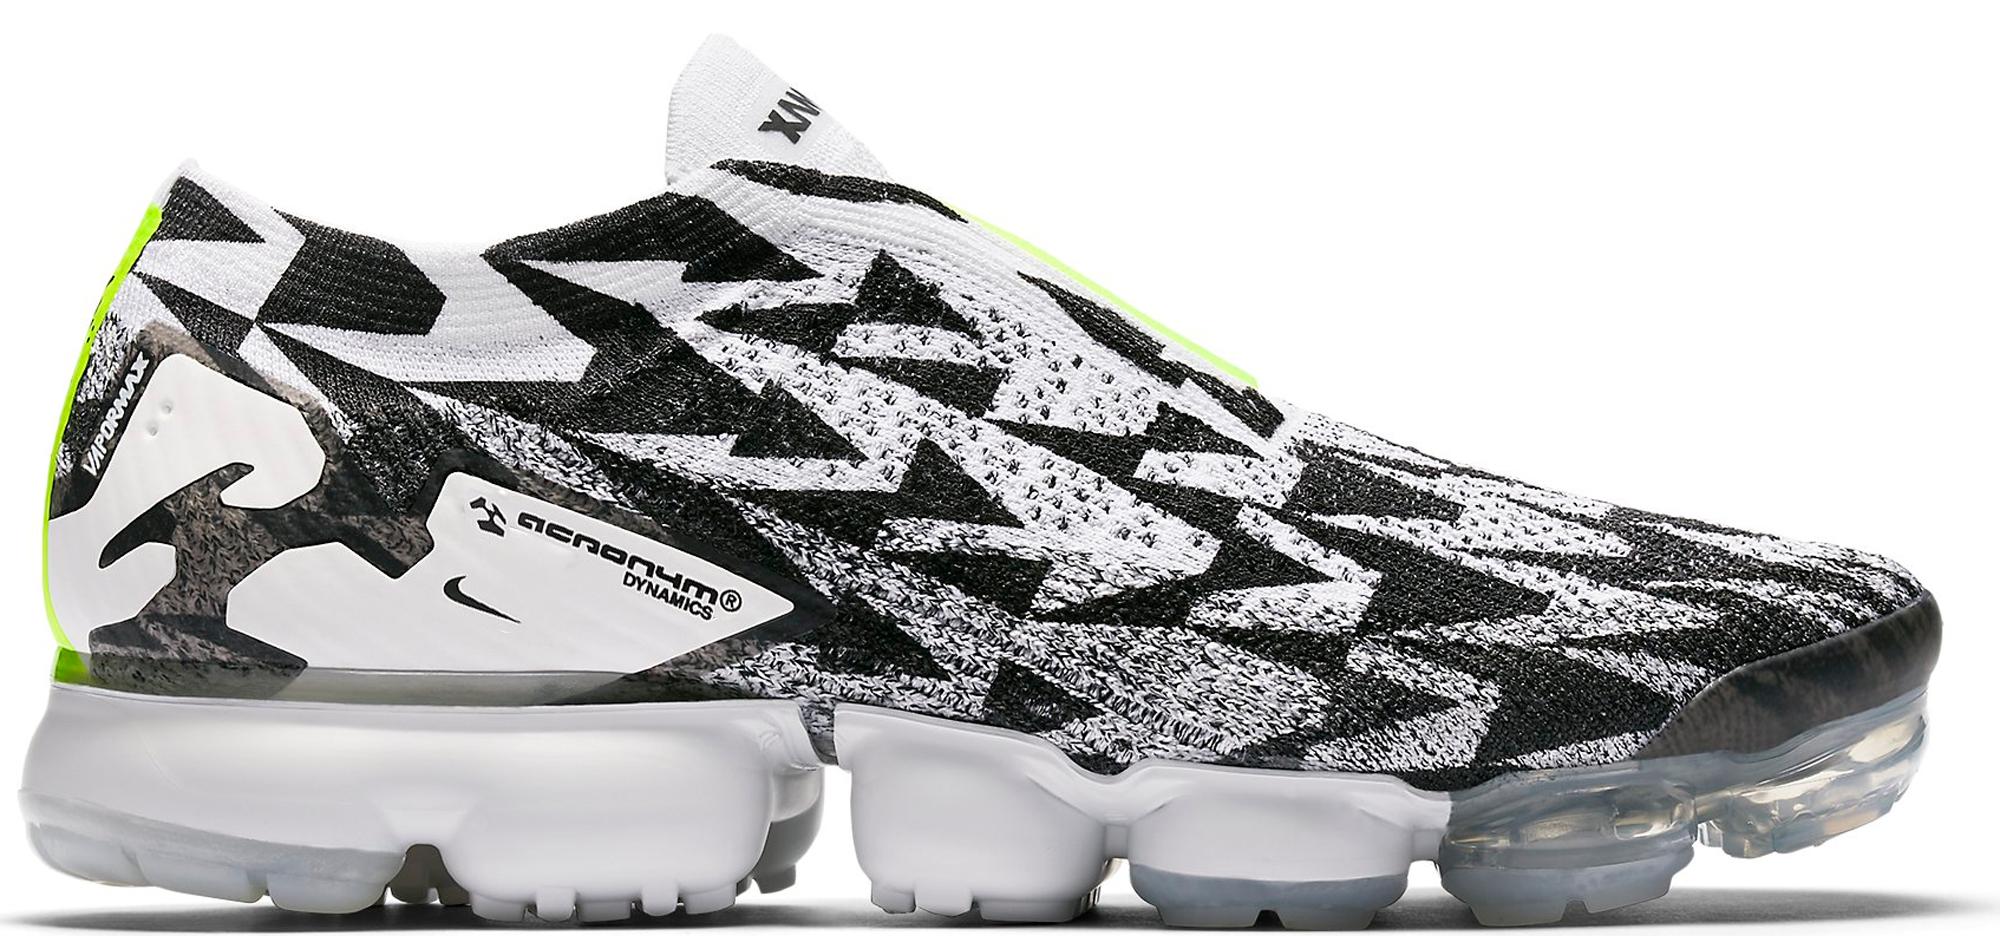 Acronym Nike VaporMax Moc 2